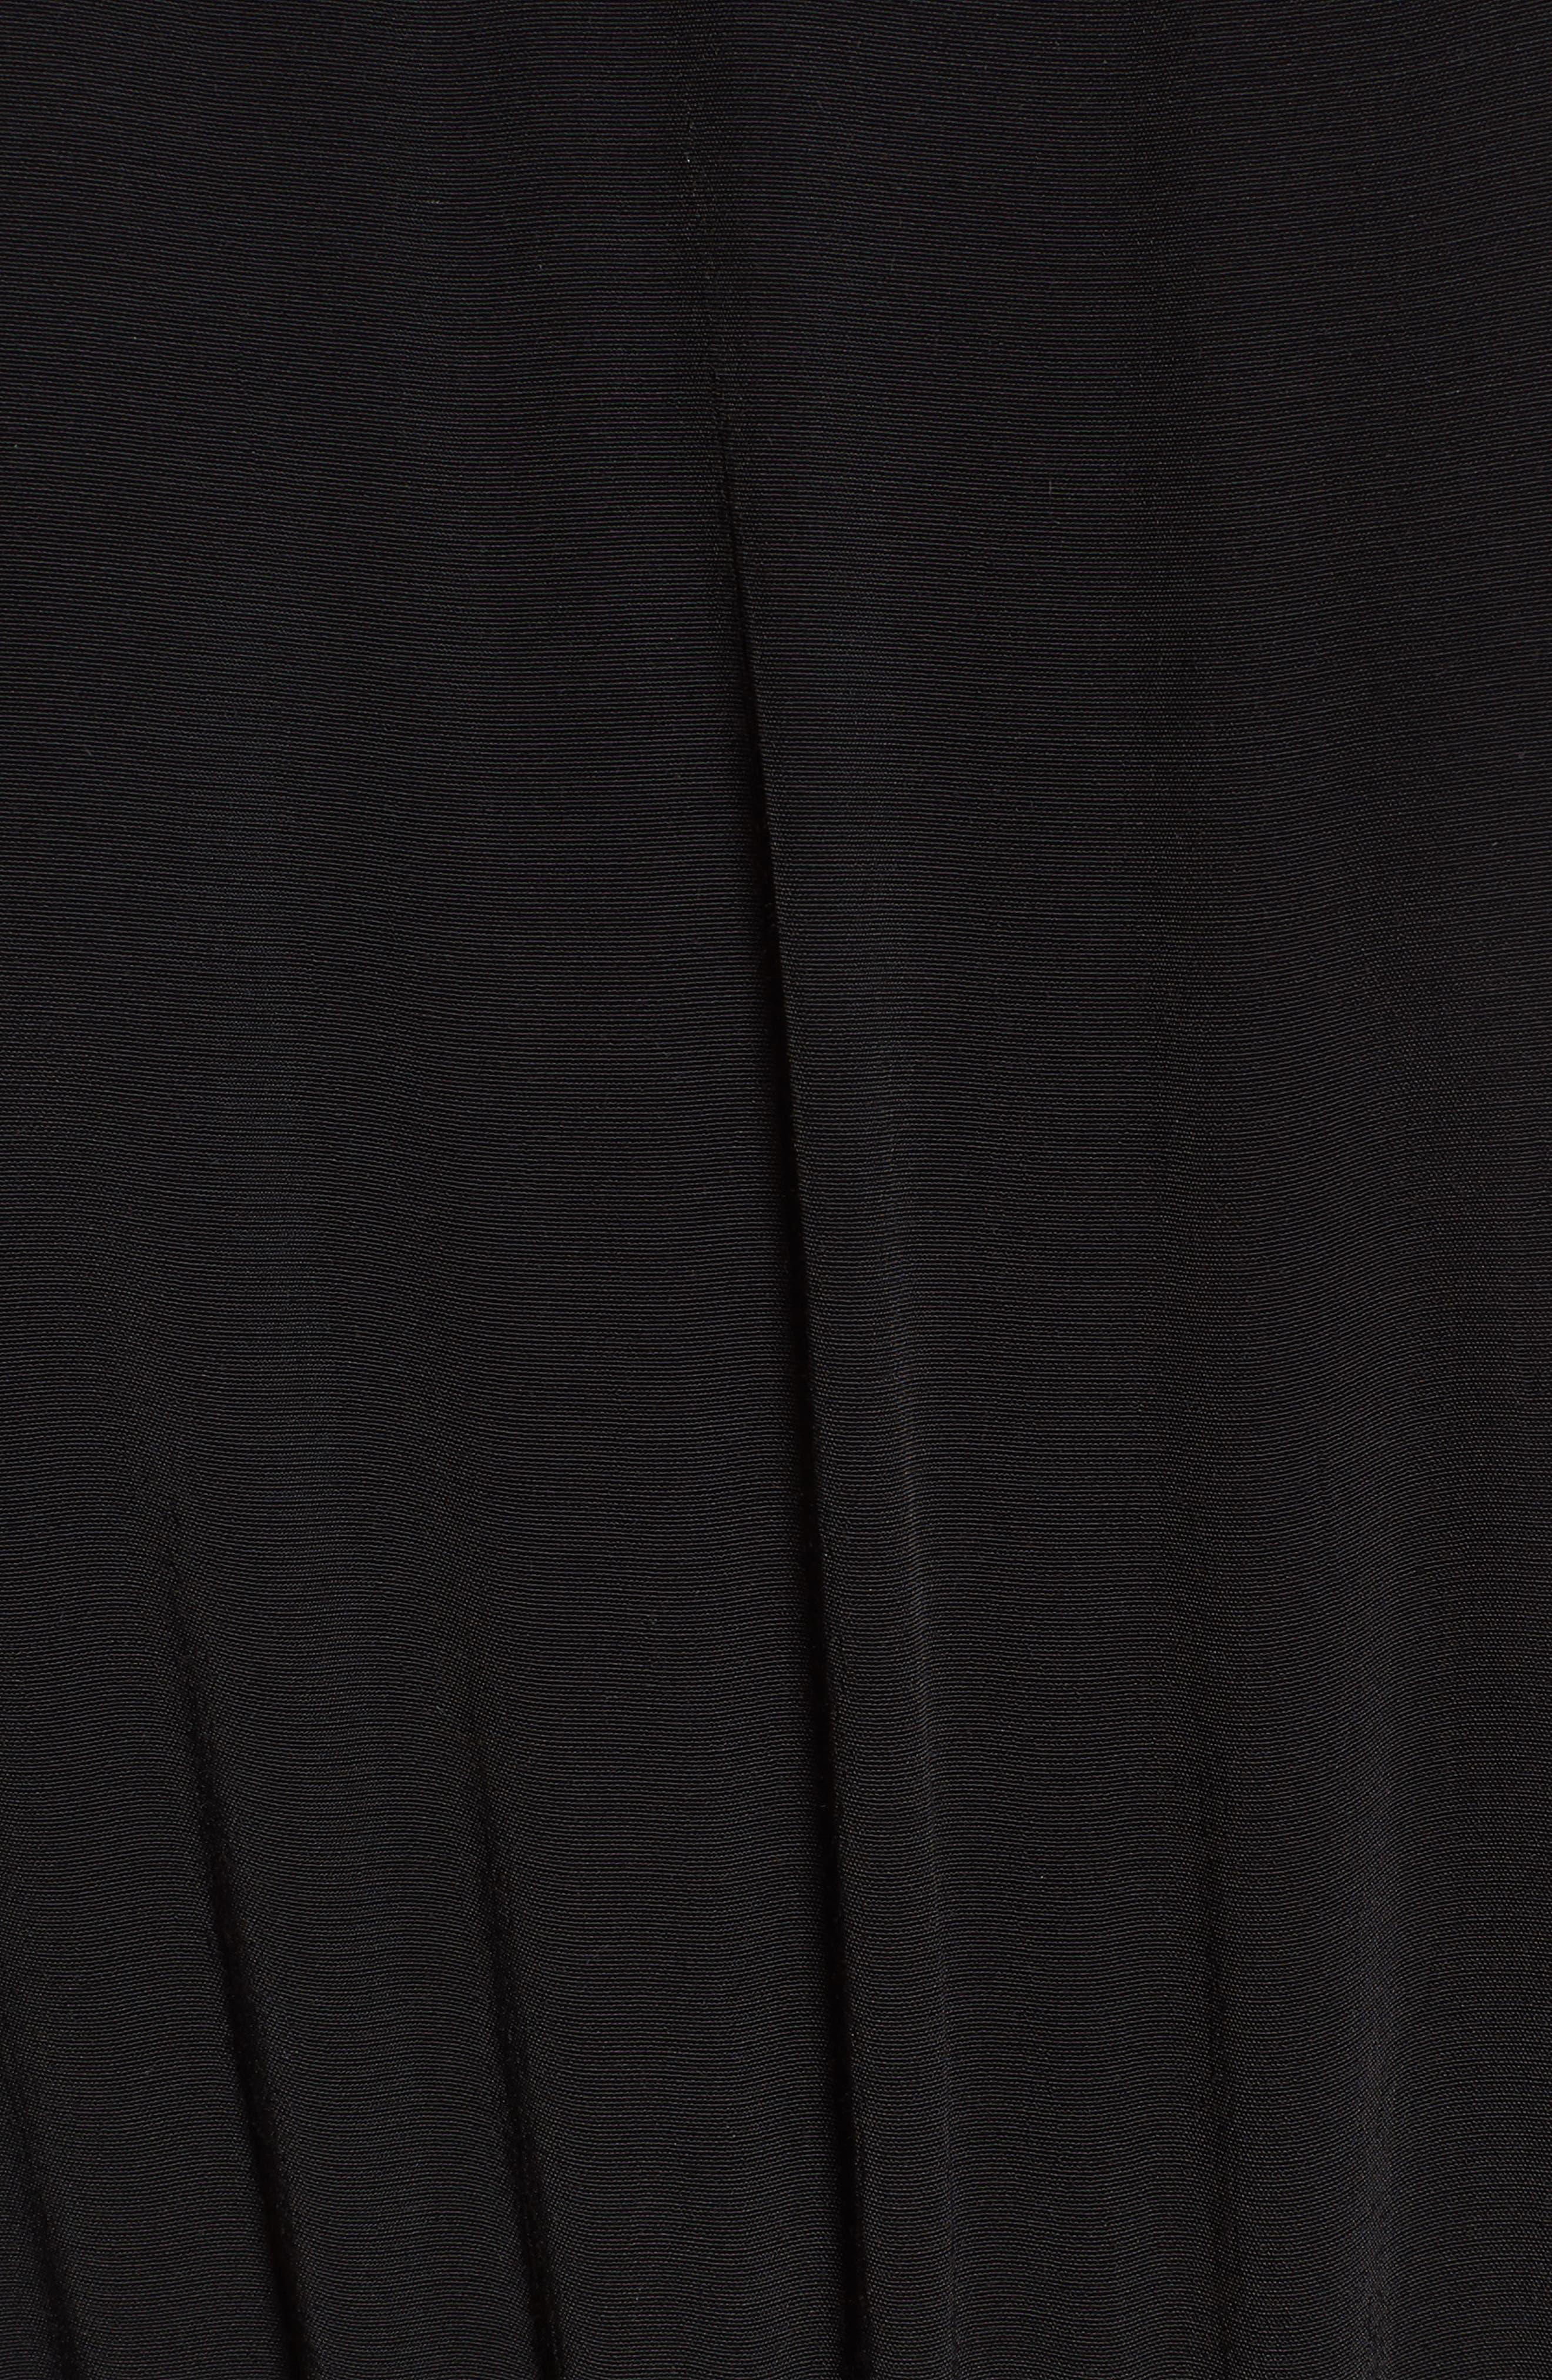 Embroidered Midi Dress,                             Alternate thumbnail 5, color,                             Black Combo